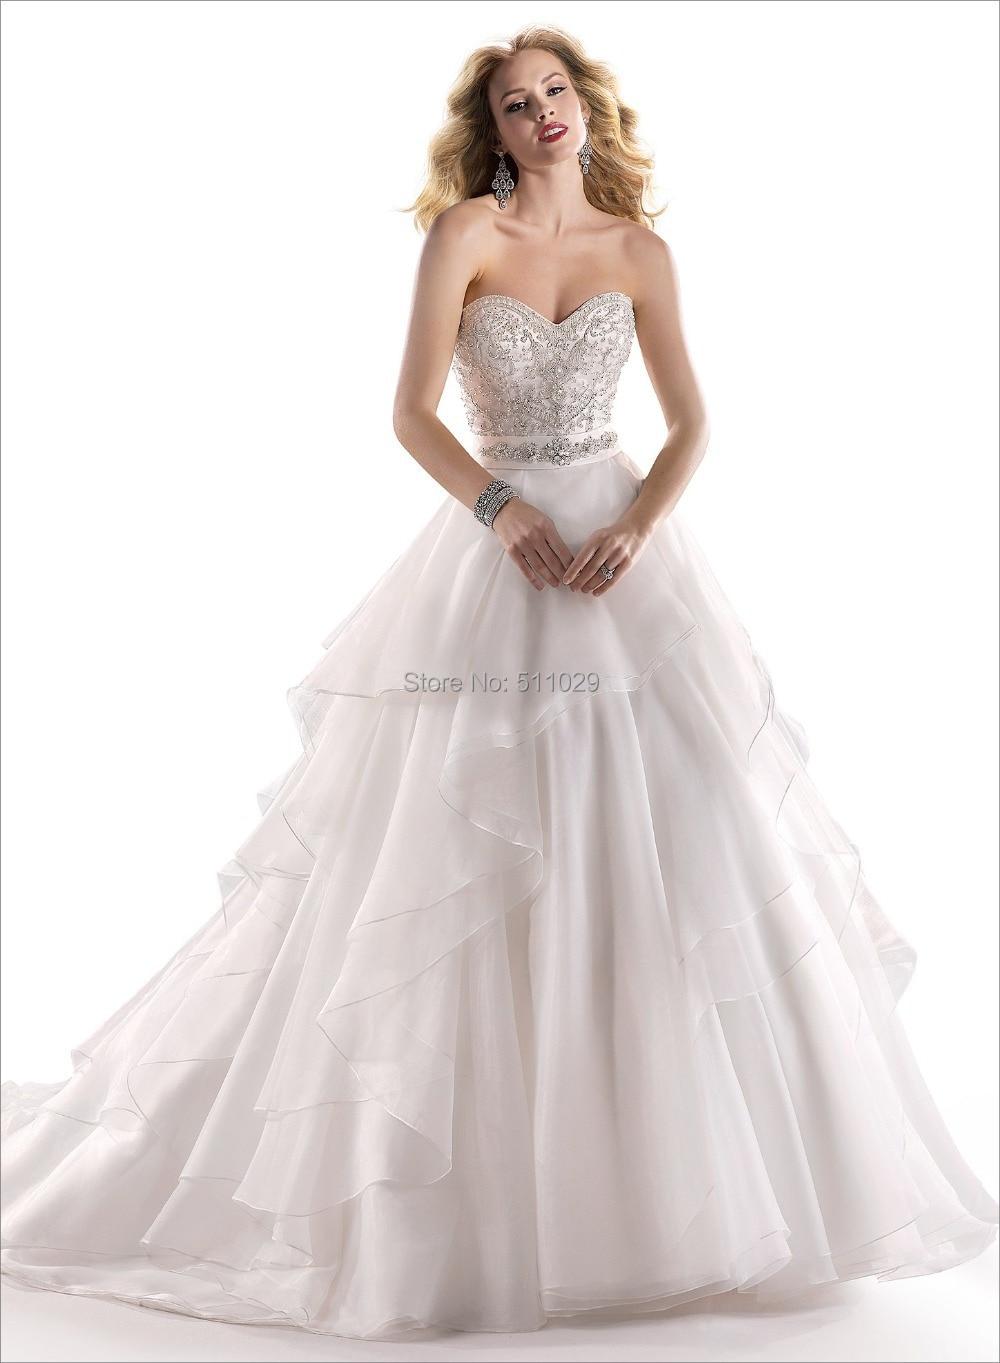 Free Shipping Wd 1776 Strapless Sxey Wedding Dress Crystal Crochet